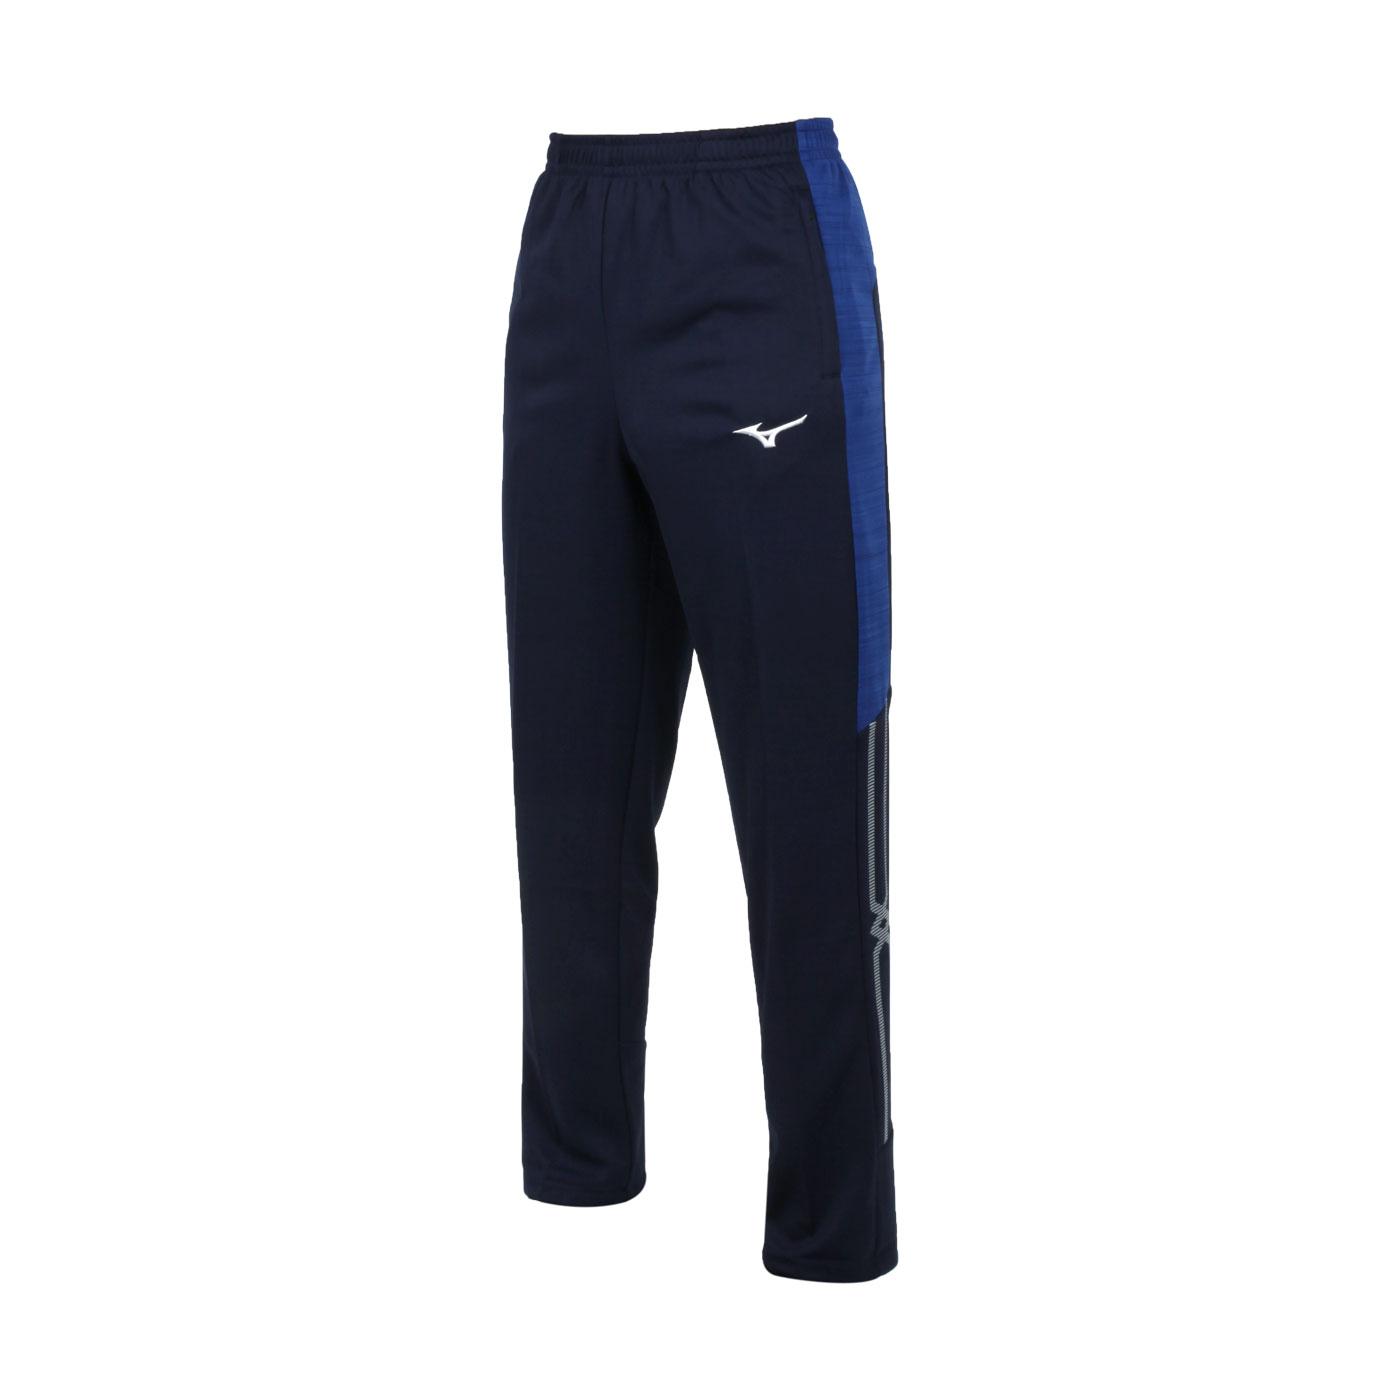 MIZUNO 男款針織長褲 32TD153382 - 丈青藍白